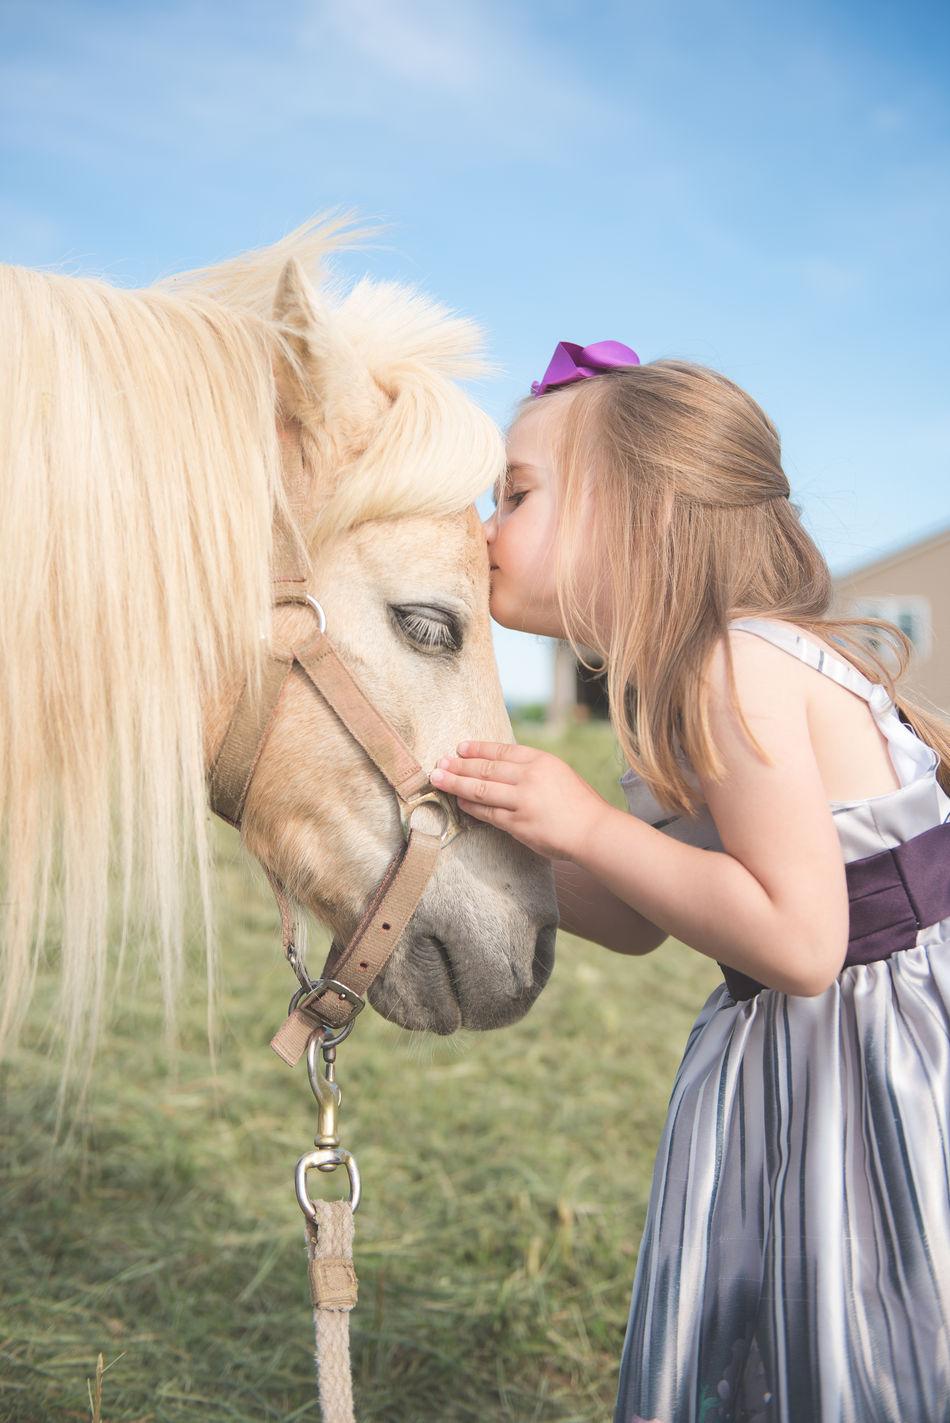 Beautiful stock photos of pferde, horse, one animal, domestic animals, sky